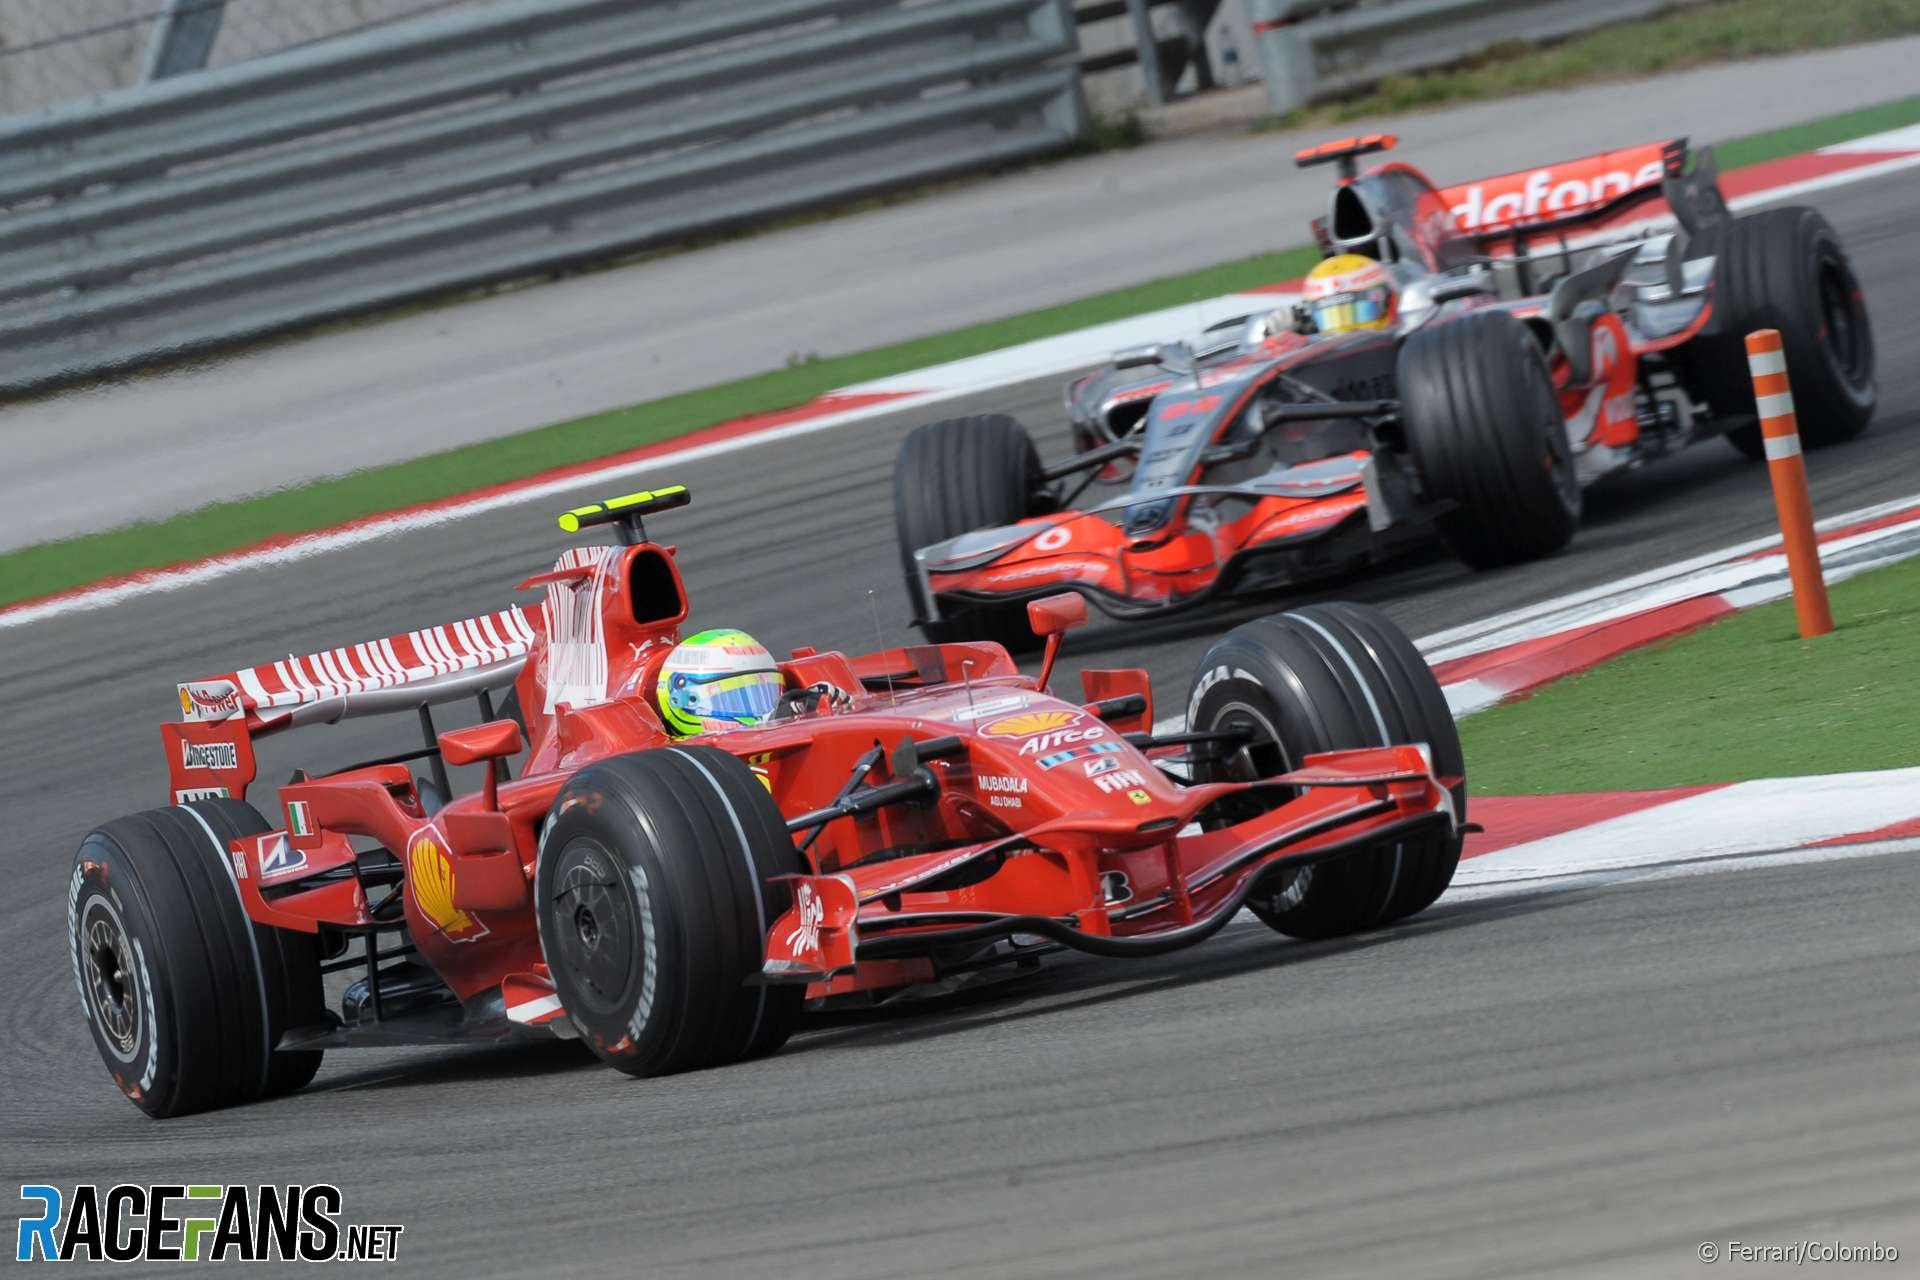 Felipe Massa, Lewis Hamilton, Istanbul, 2008